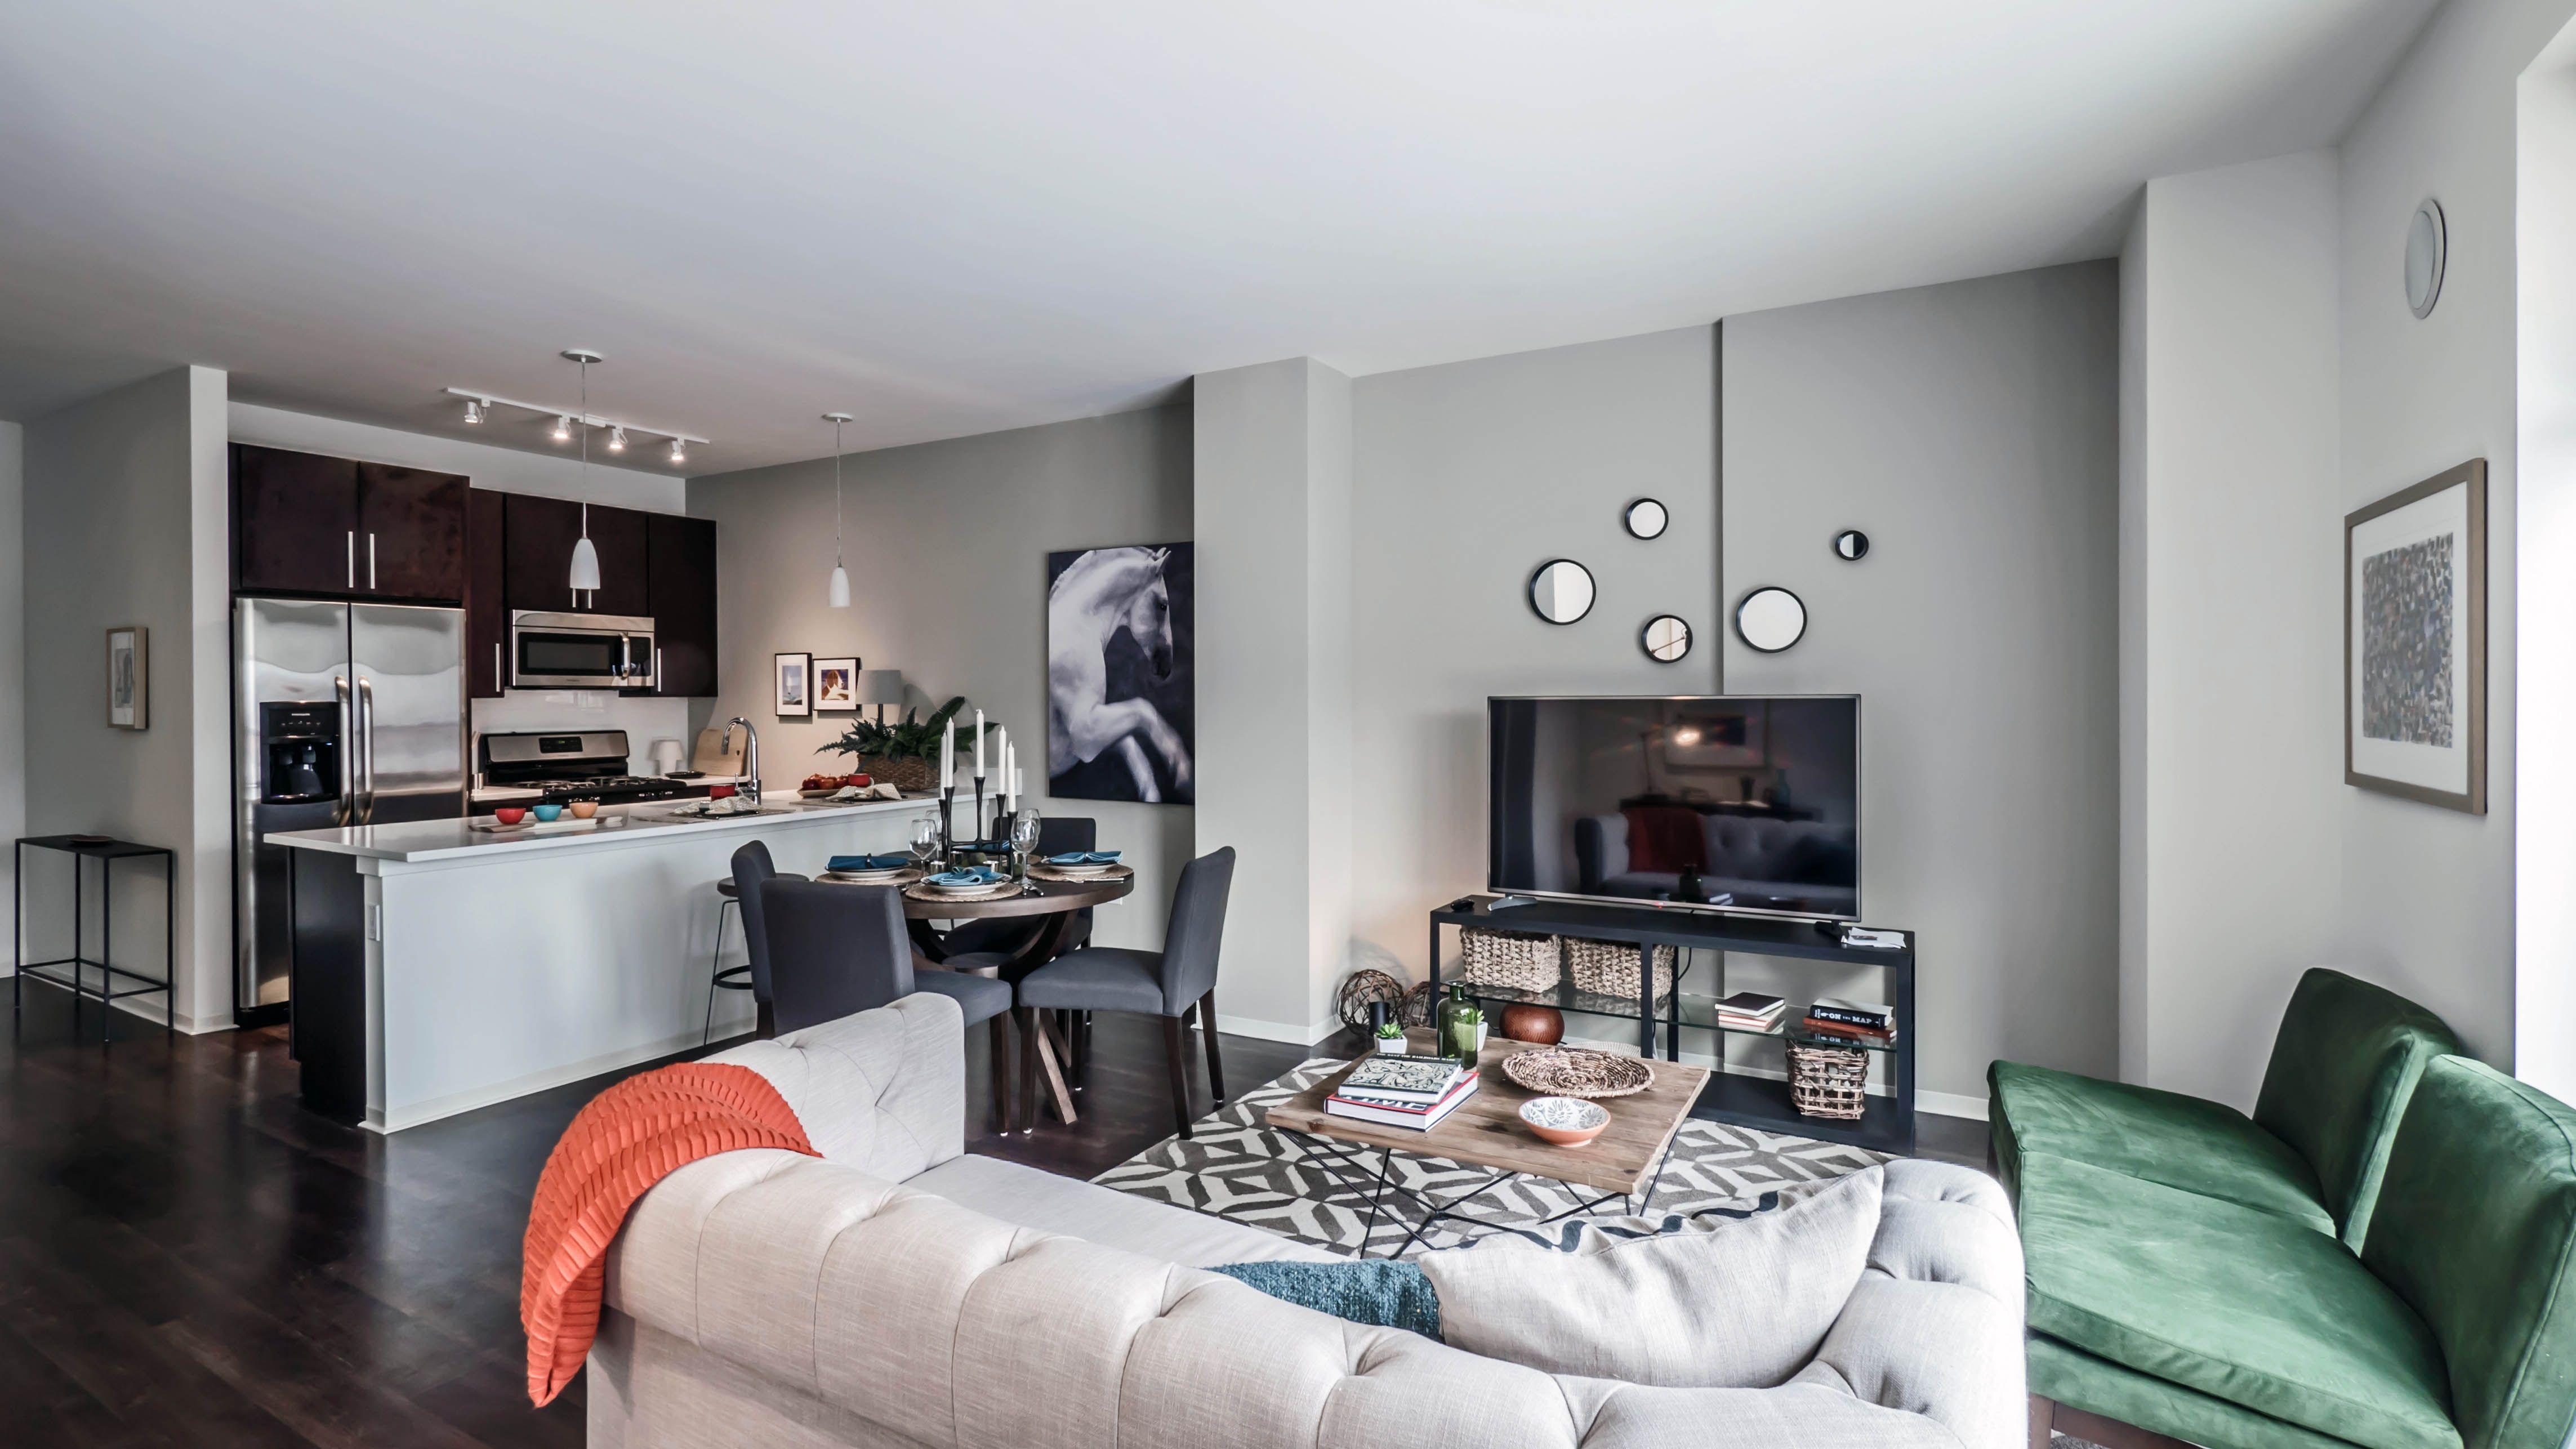 Craigslist One Bedroom Modern Apartment Decor 1 Bedroom Apartment Modern Apartment